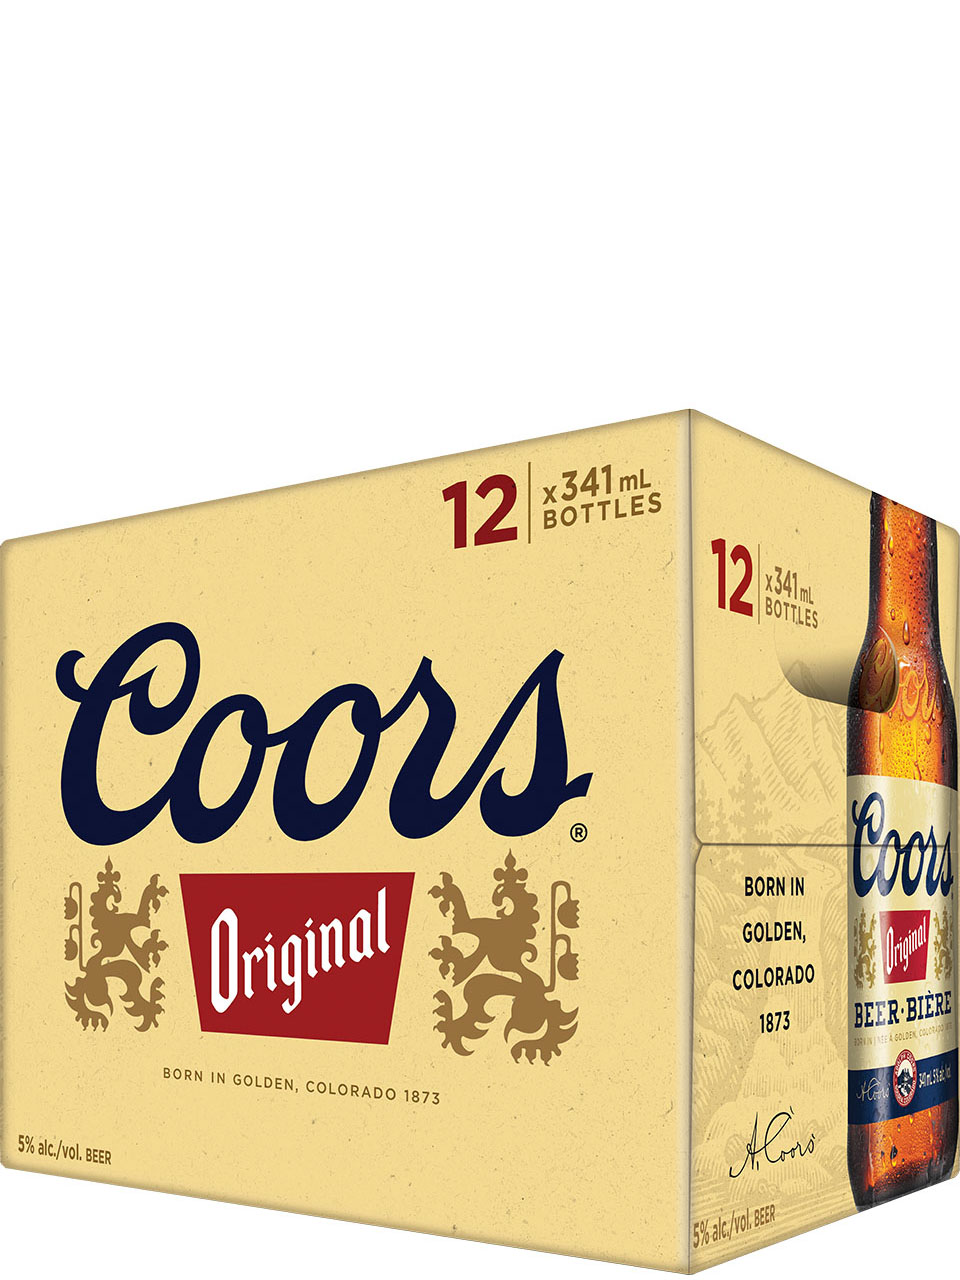 Coors Original 12 Pack Bottles